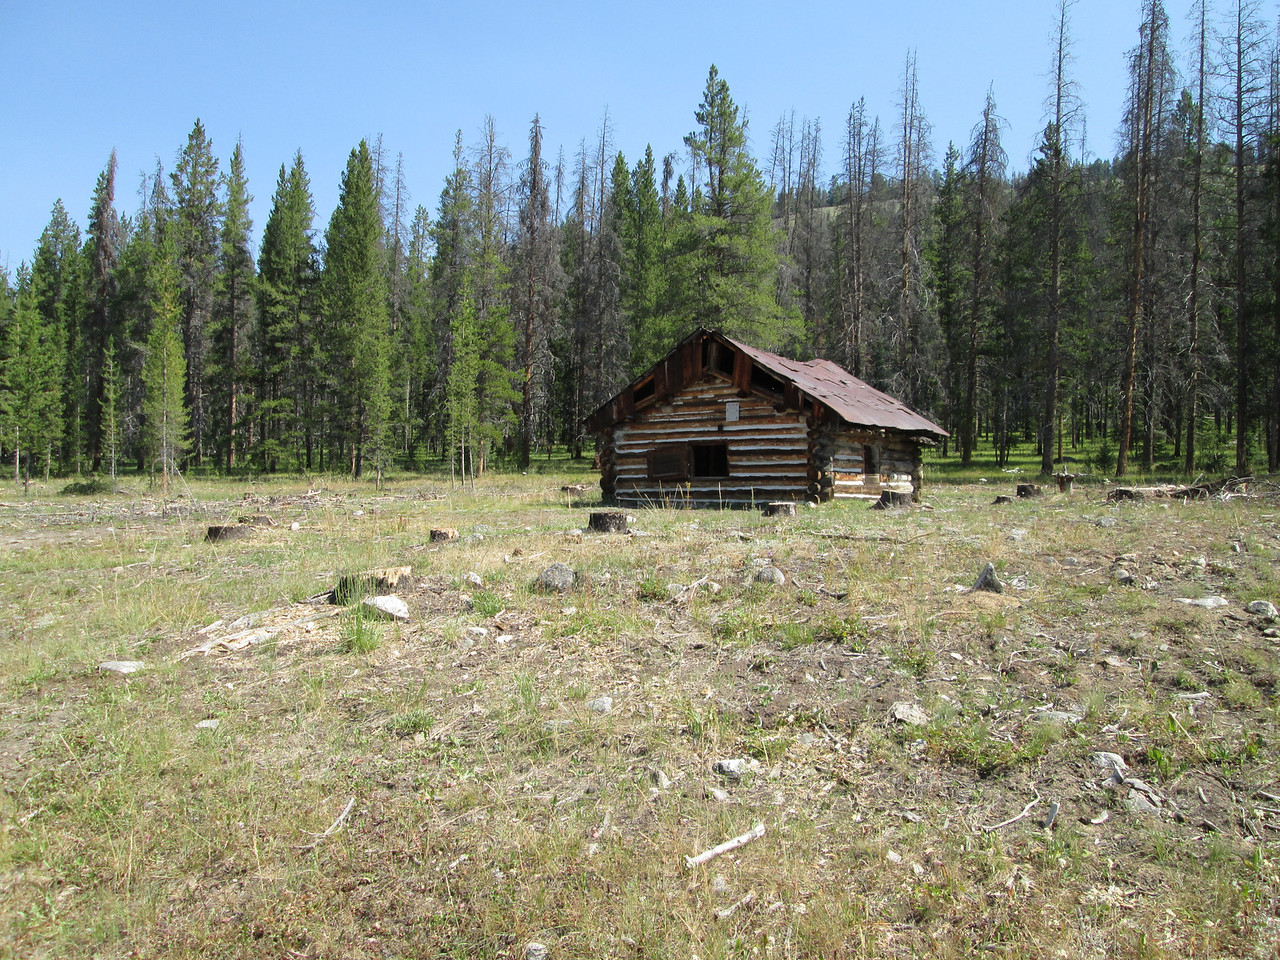 20130813 Cabin near Ghost Town Coolidge